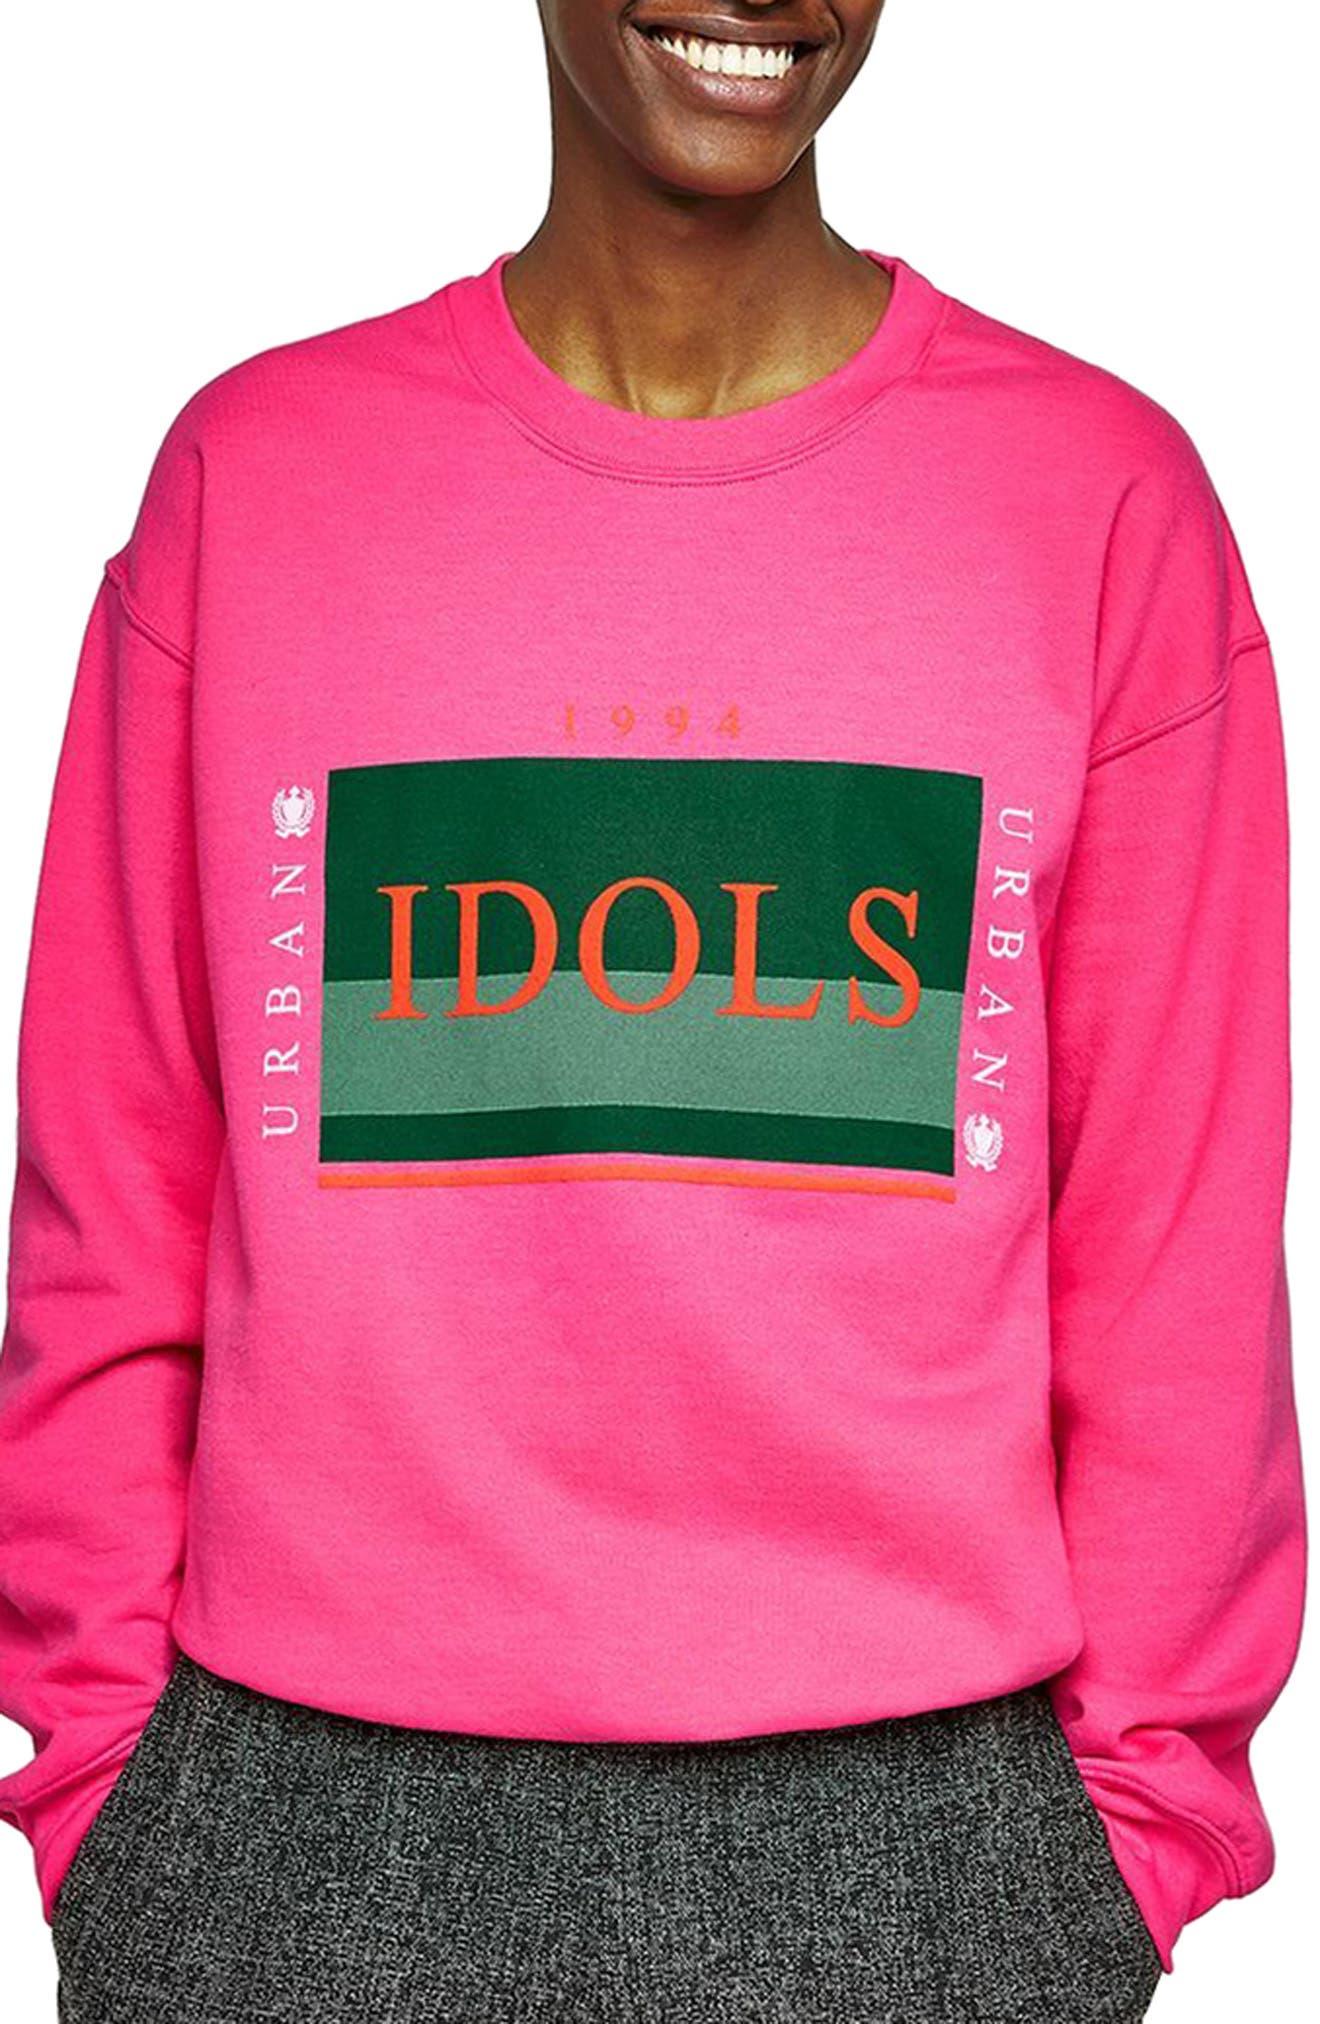 Urban Idols Graphic Sweatshirt,                         Main,                         color, 650